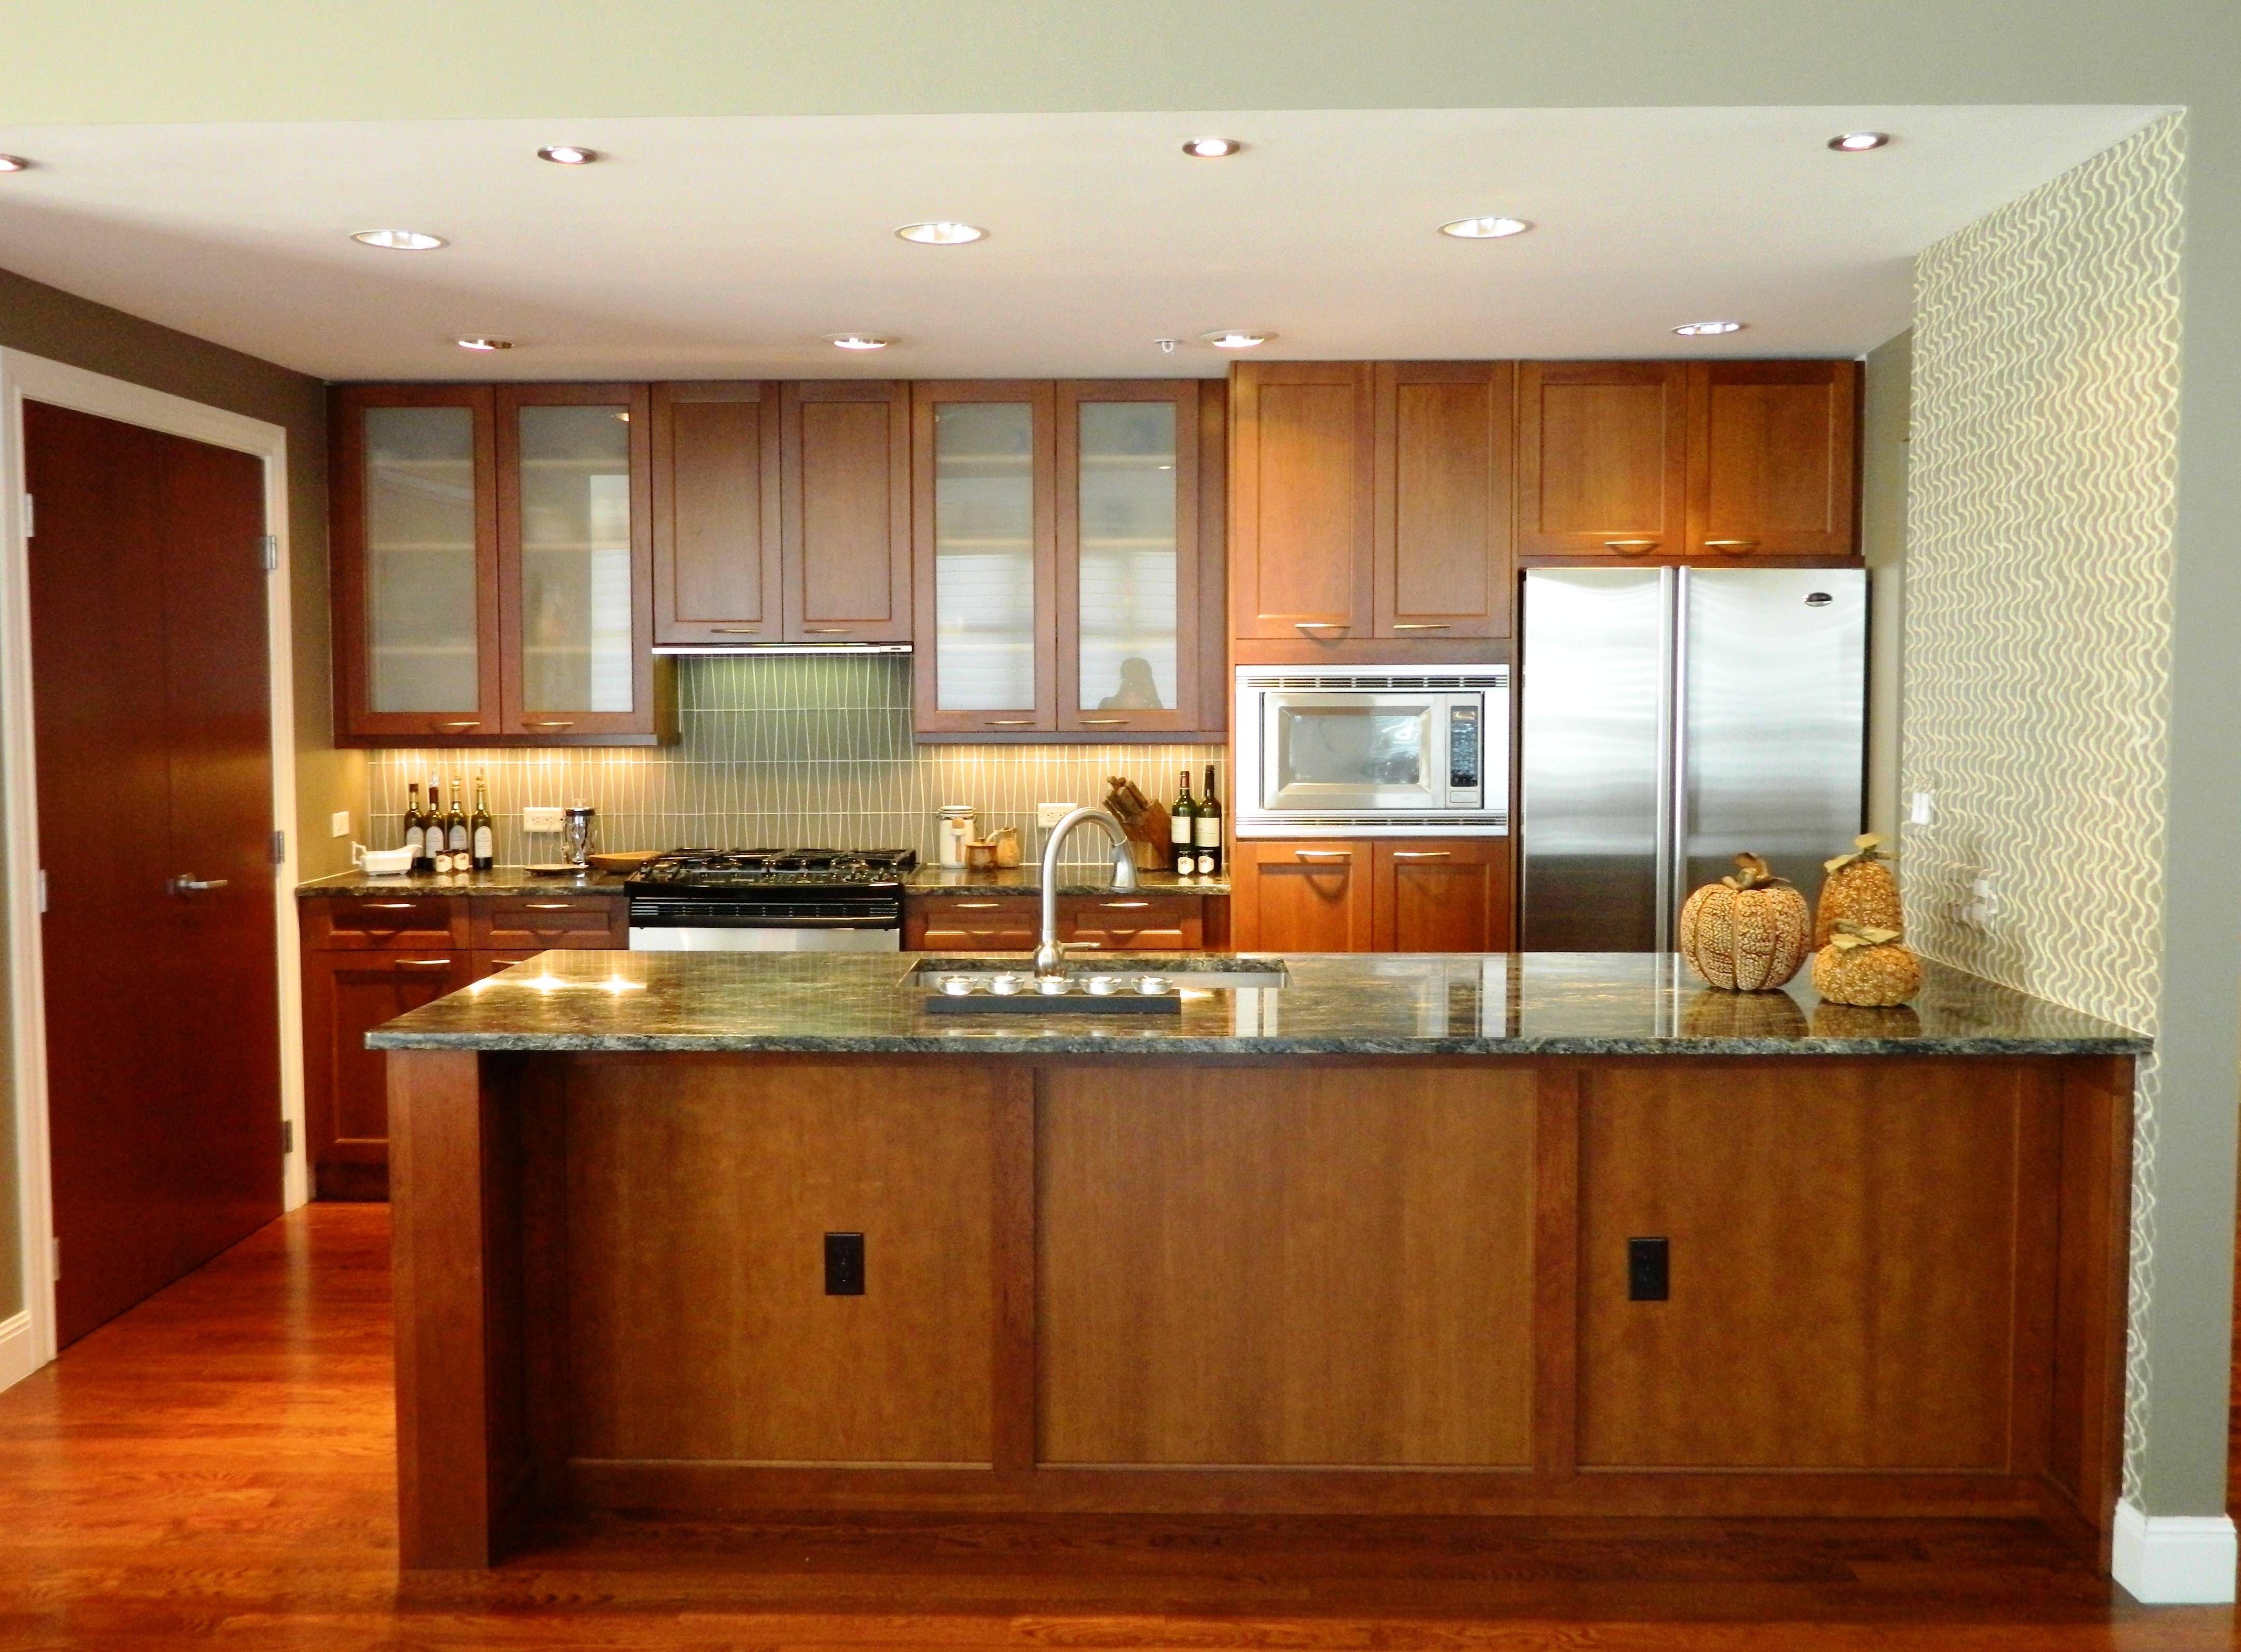 Image result for honey oak cabinets modern kitchen cherry ...